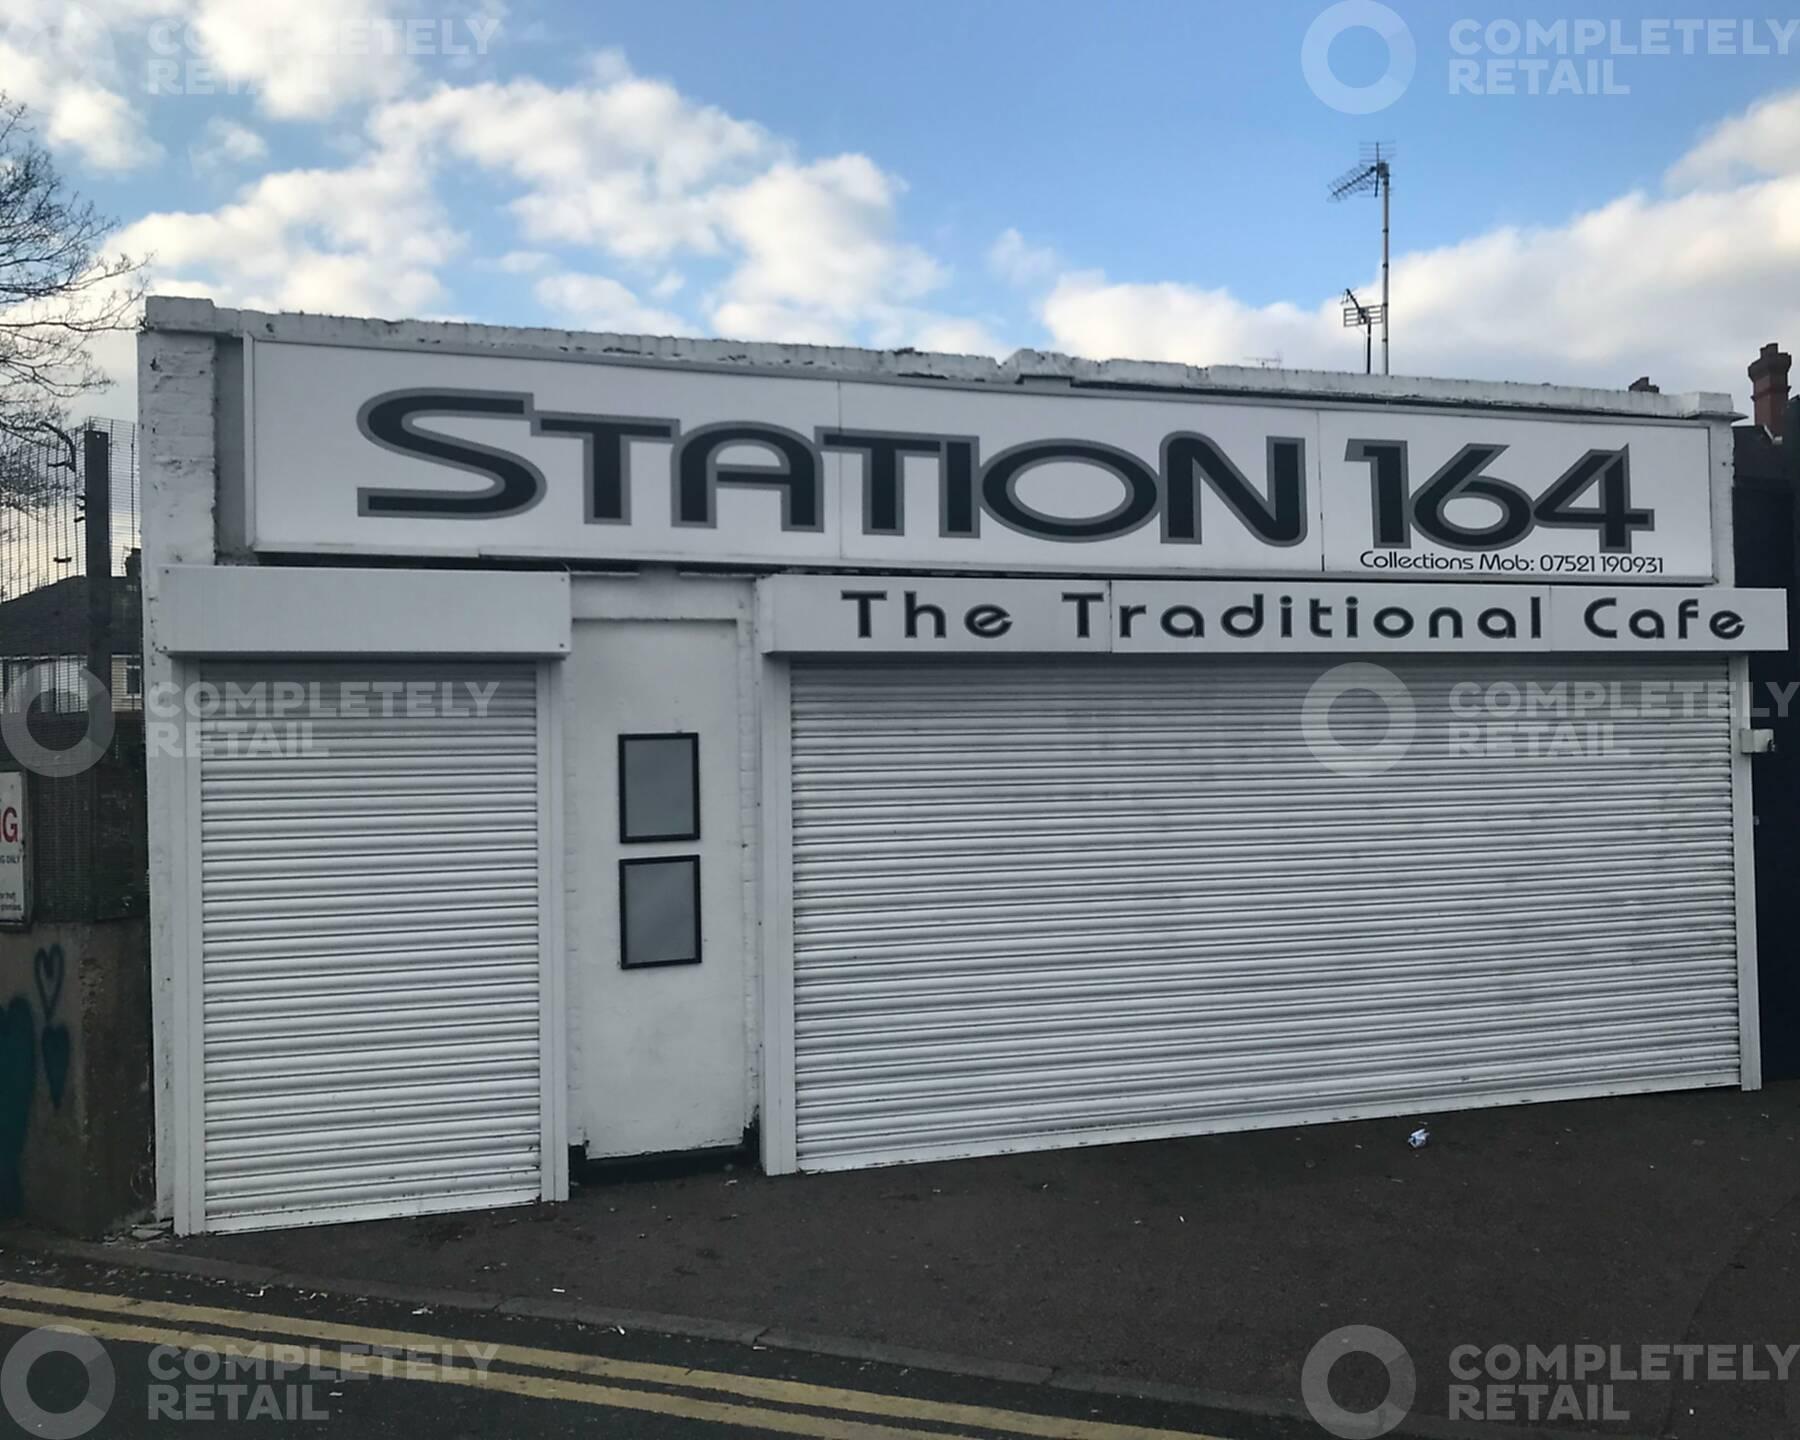 164 Station Lane, Hornchurch